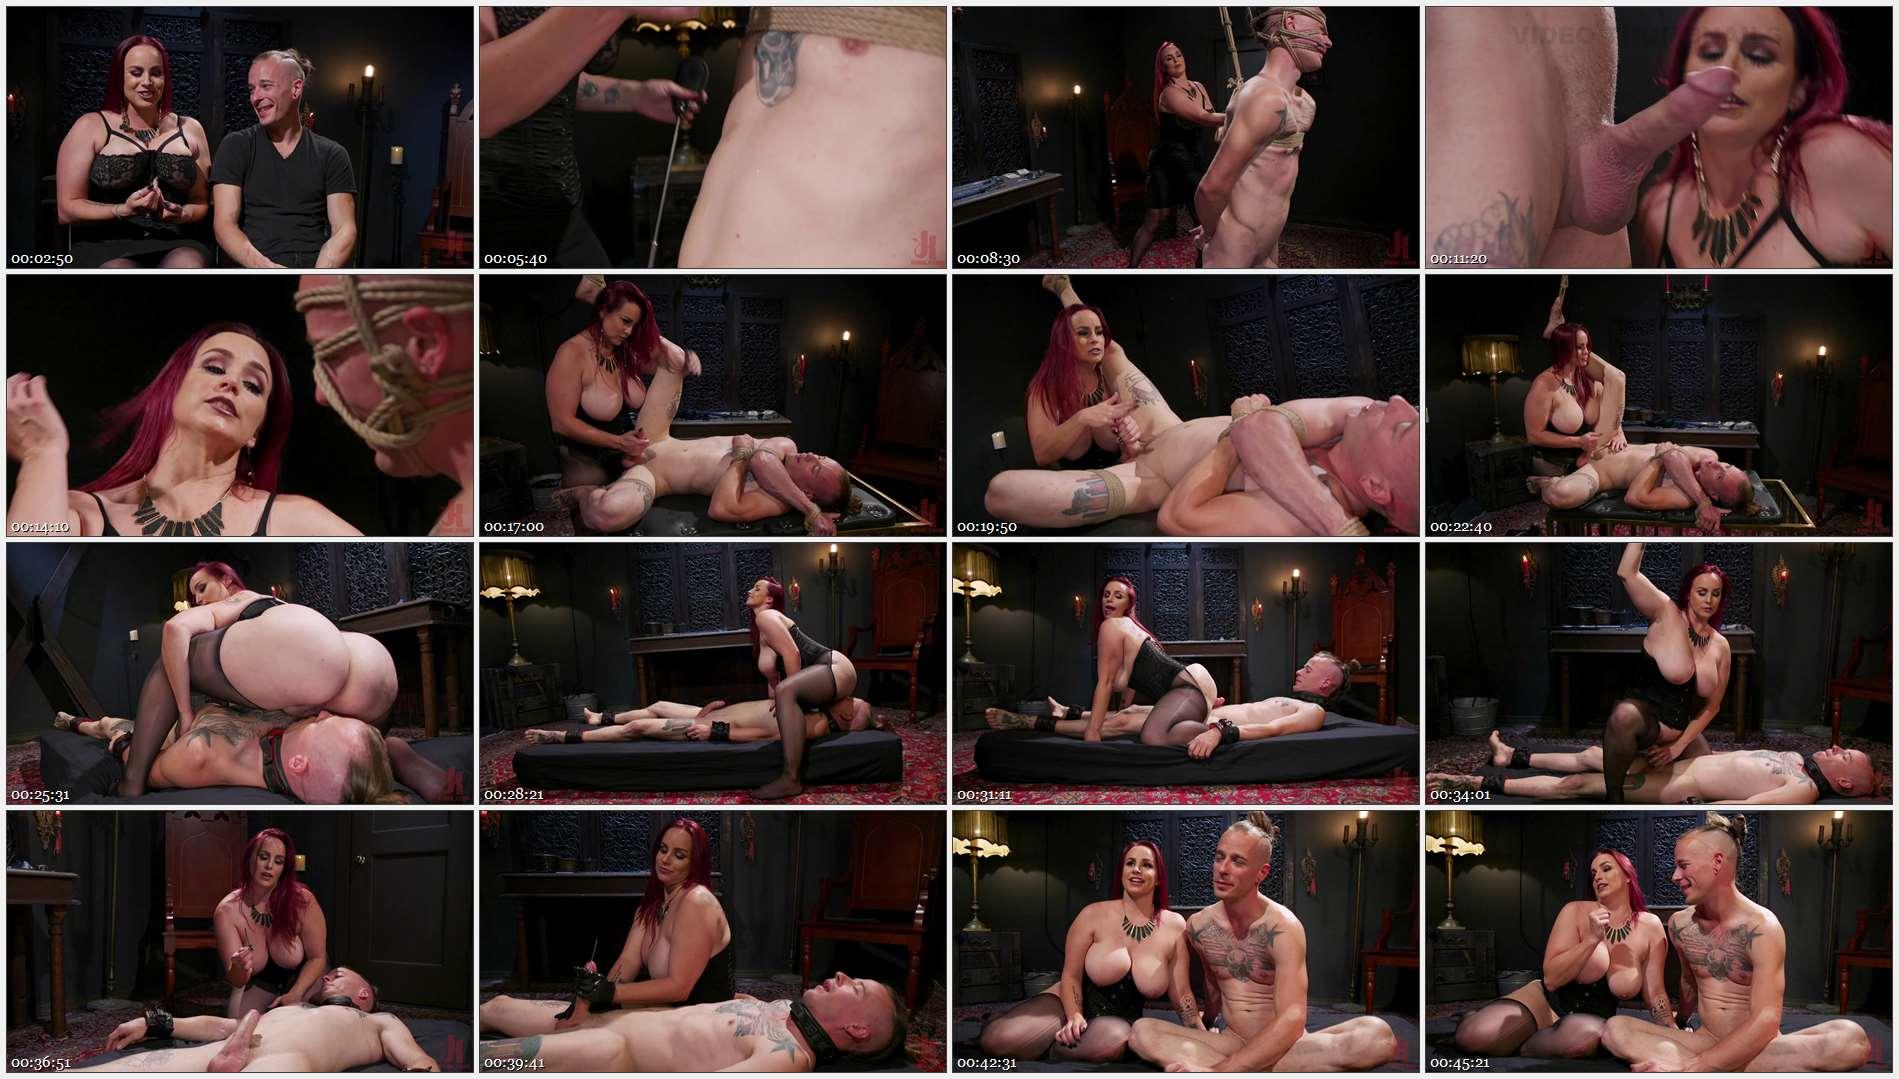 Bella Rossi – Bella Rossi Uses & Abuses Jessie Sparkles